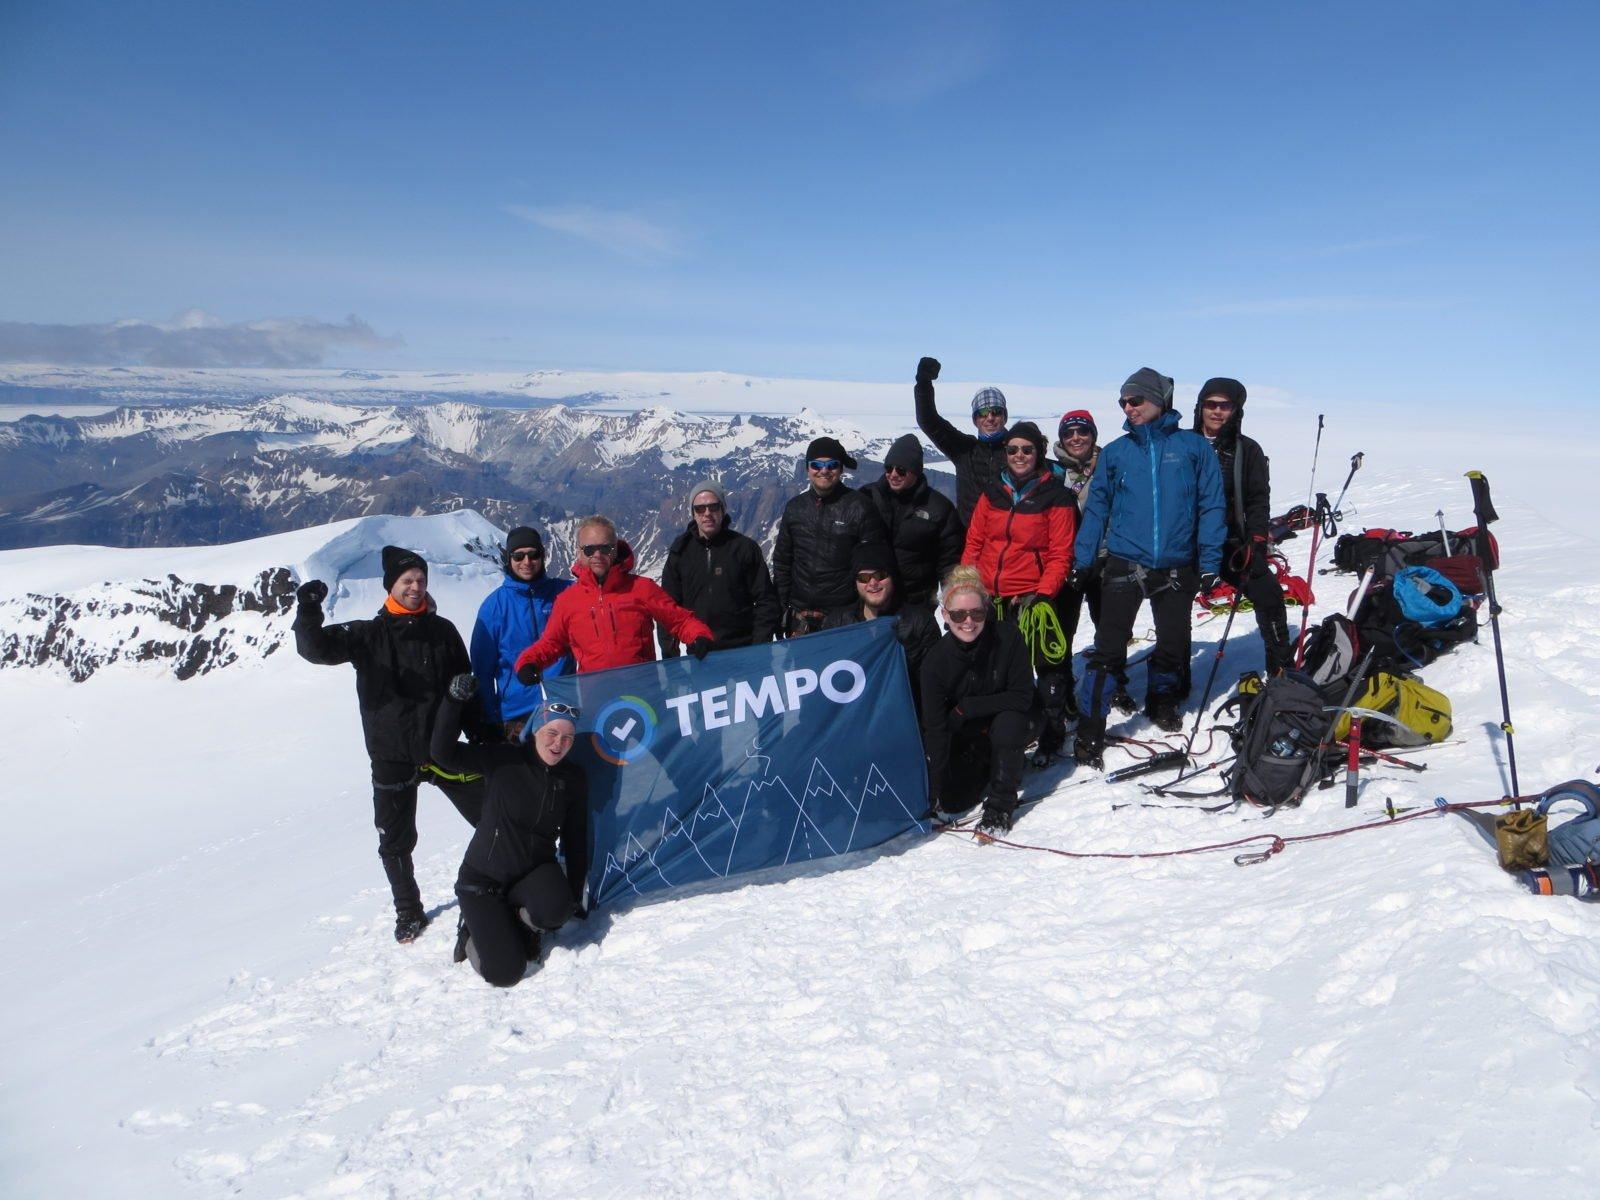 The Tempo team